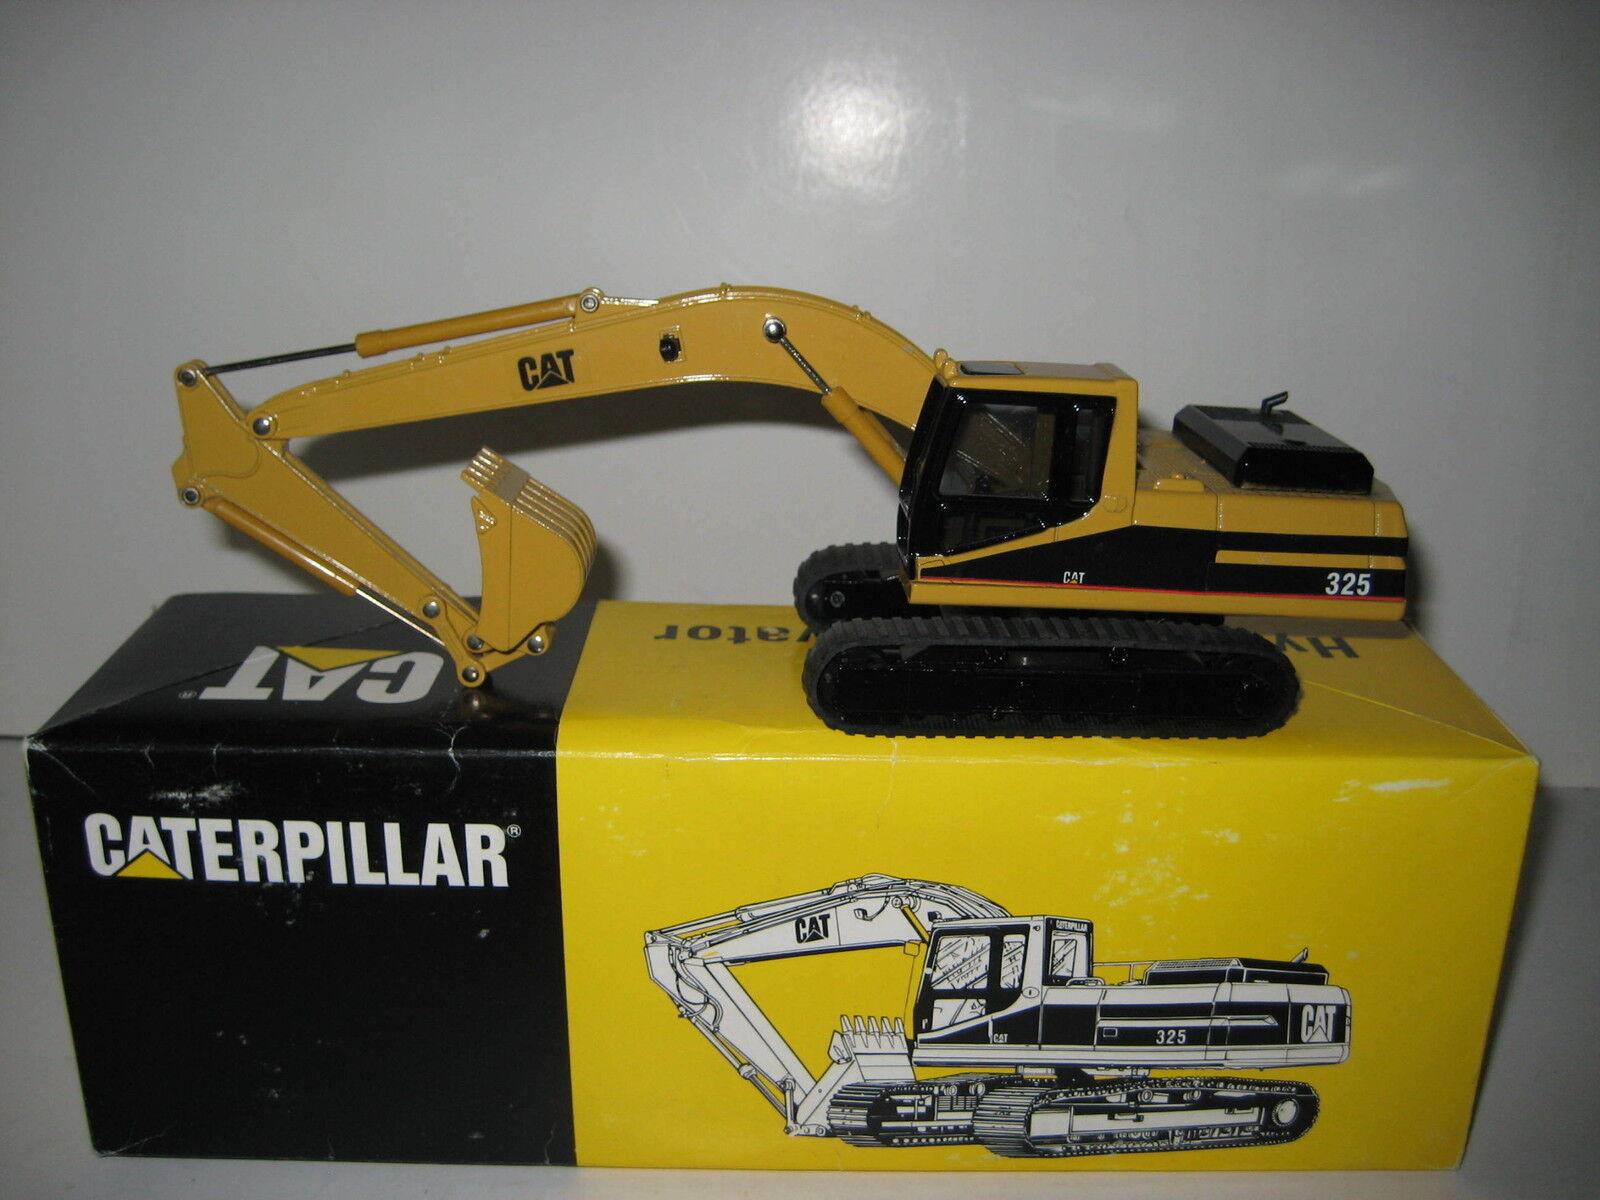 Caterpillar 325 Excavateurs tieflöffel SHINSEI 1 50 neuf dans sa boîte RARE